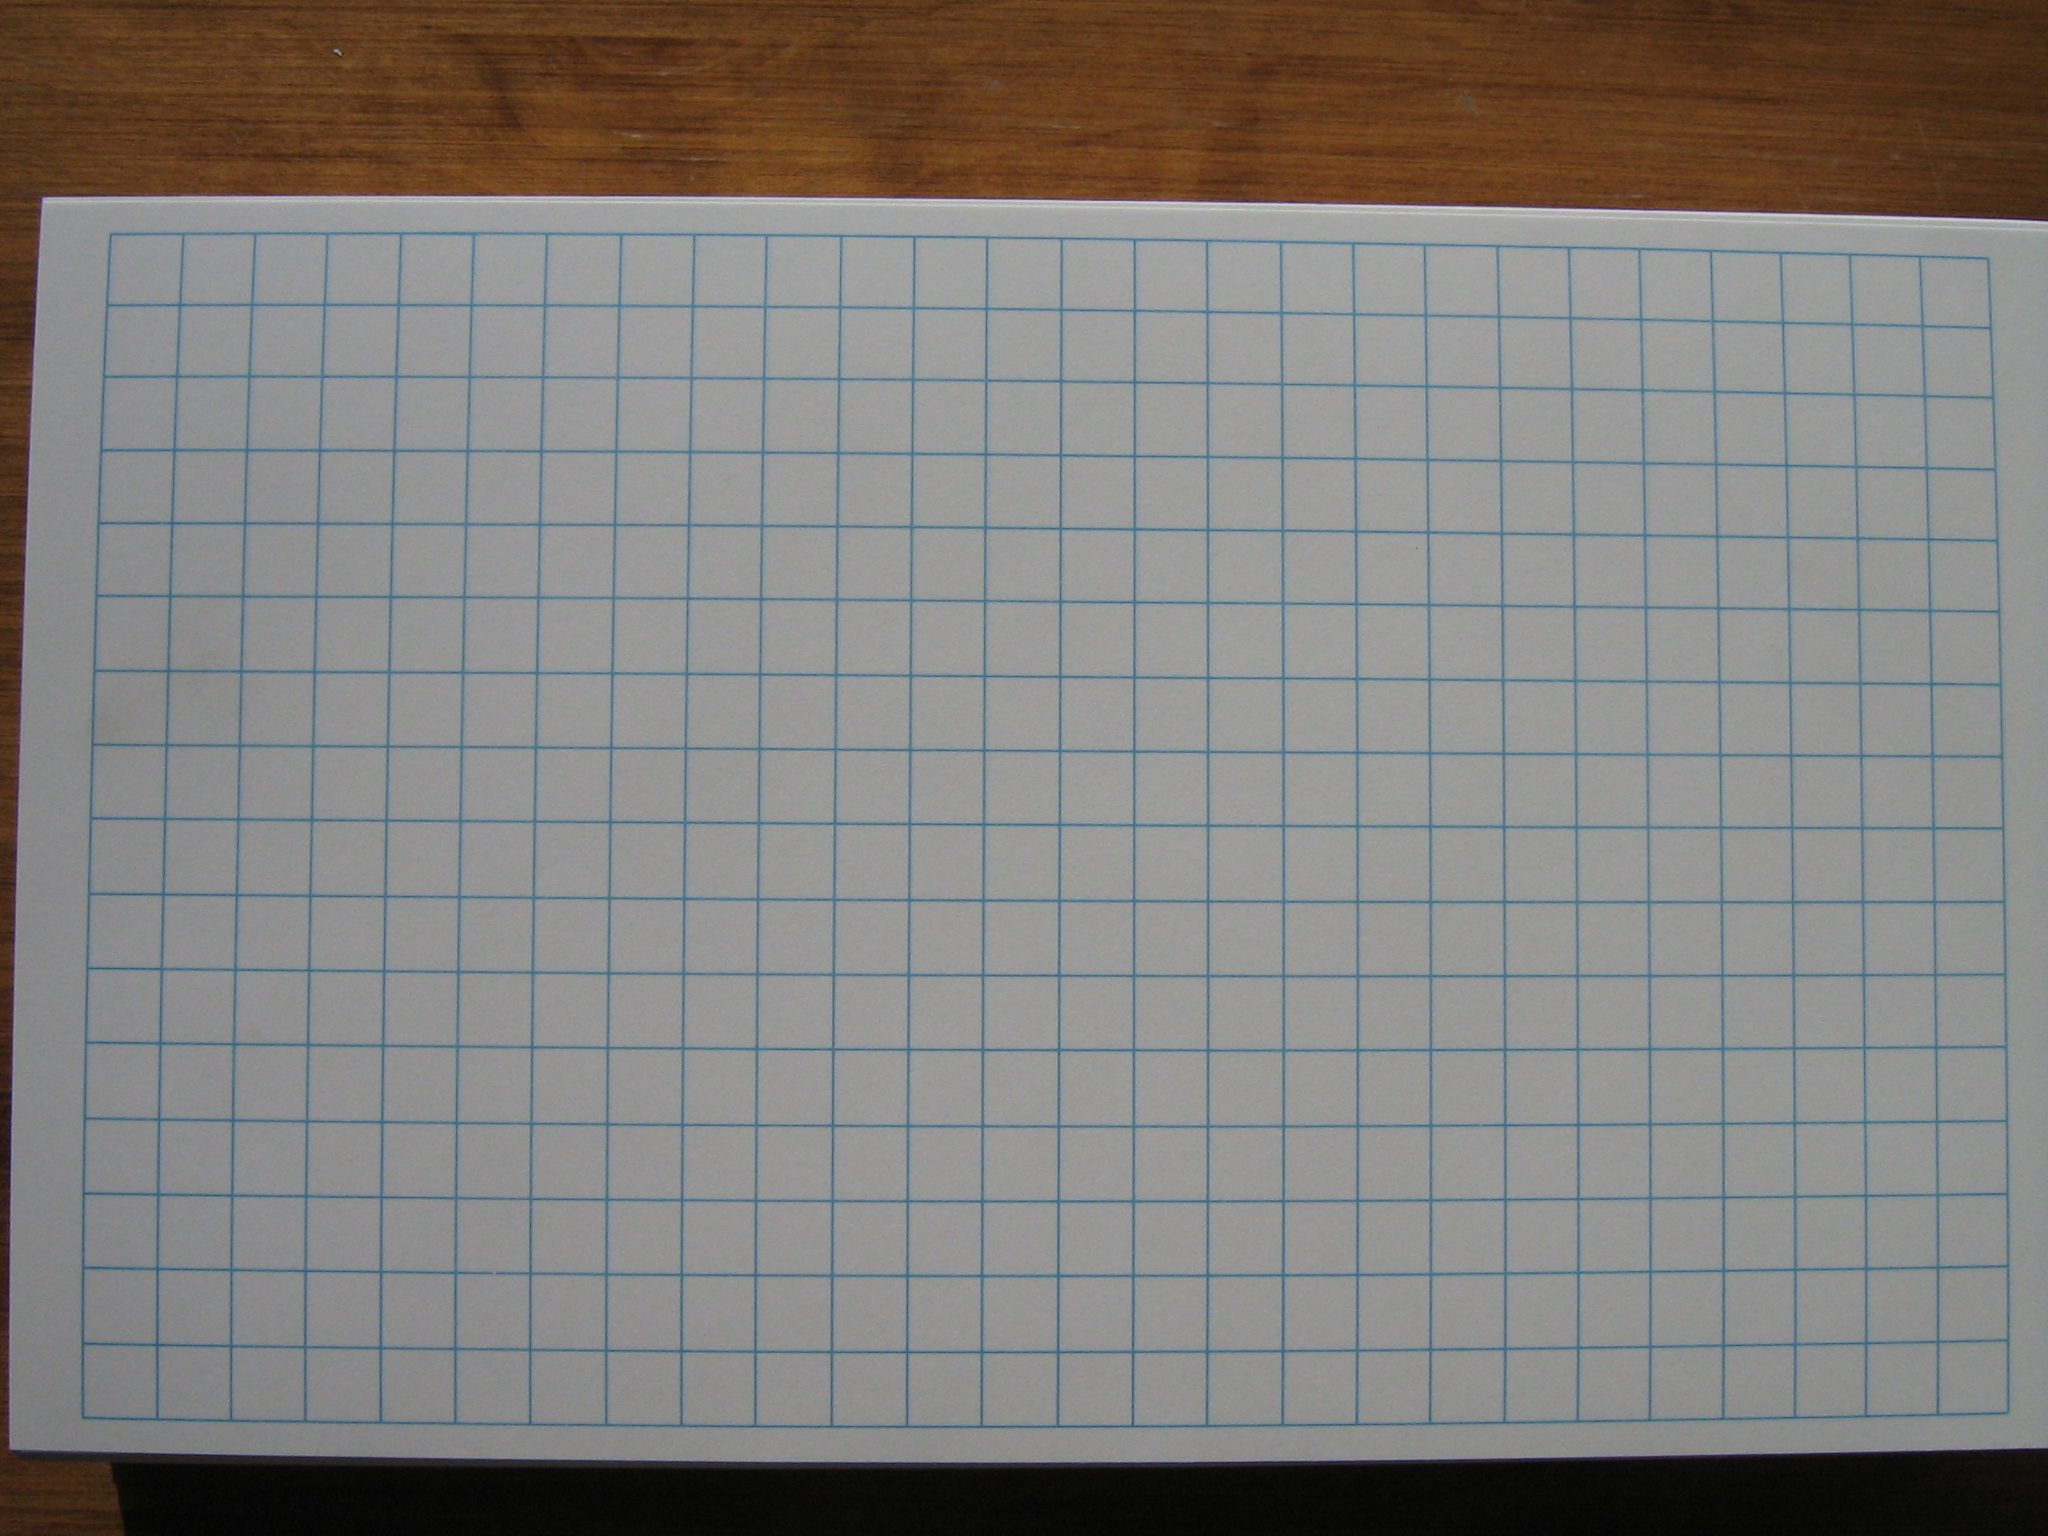 graph paper sheet - Etame.mibawa.co